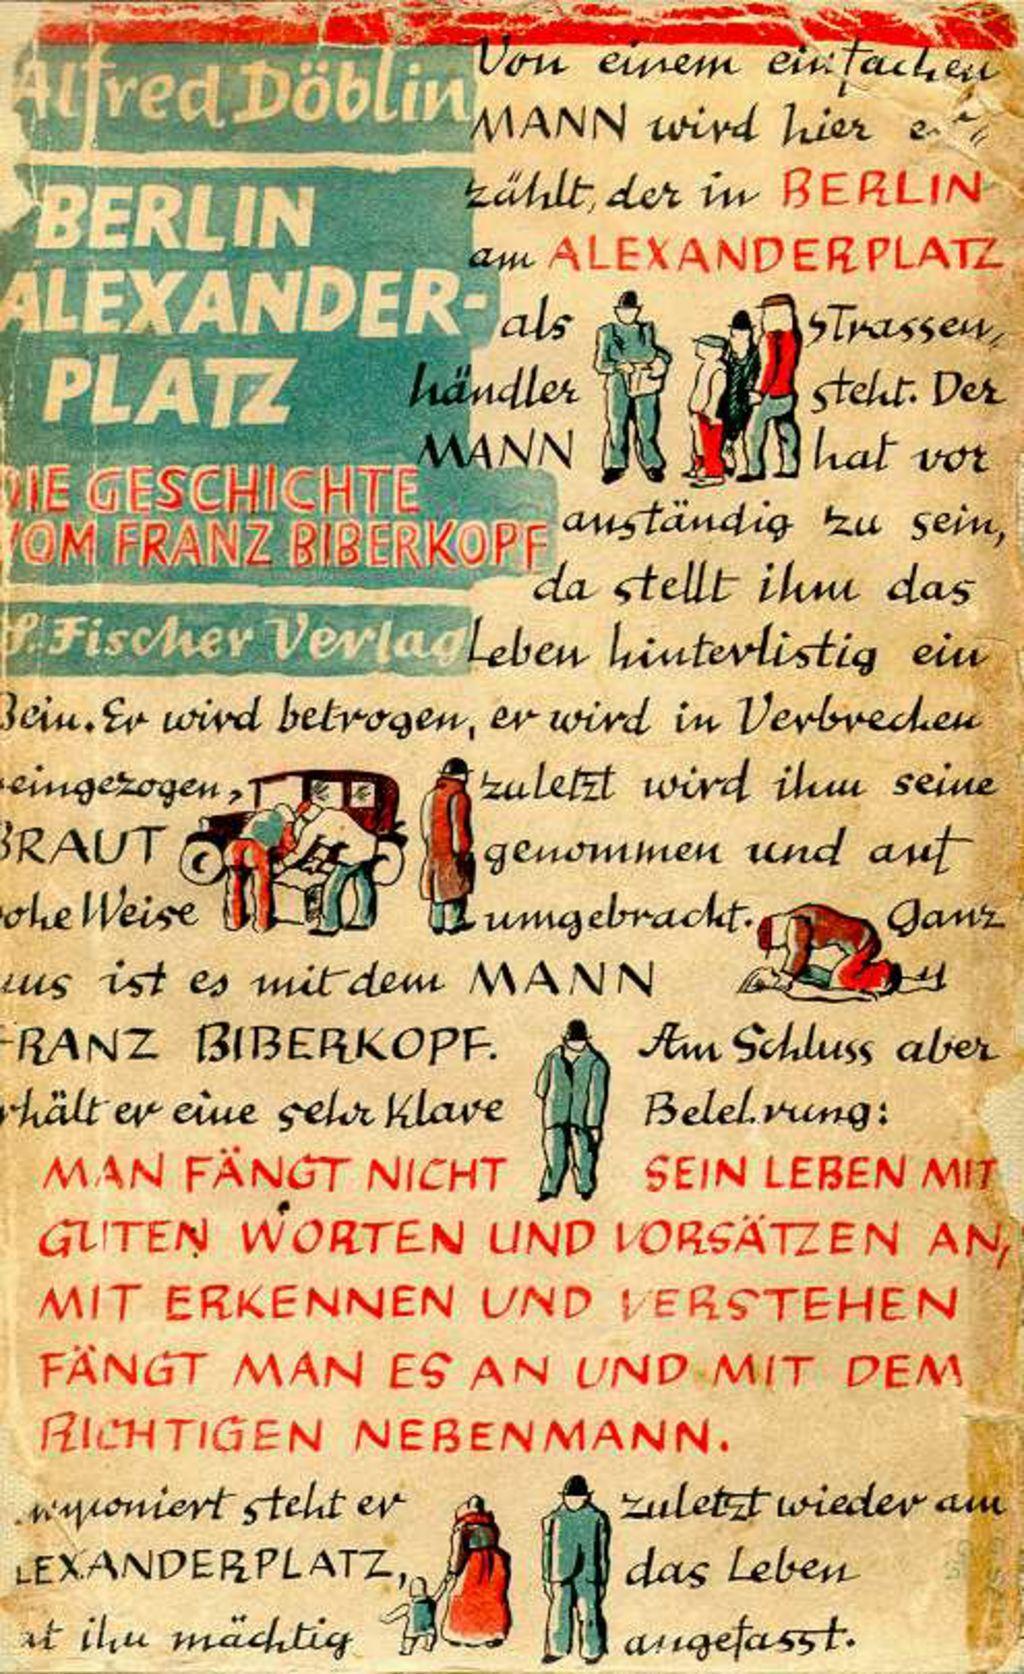 Lemo Bestandsuche Alexanderplatz Bucher Berlin Alexanderplatz Deutsche Literatur